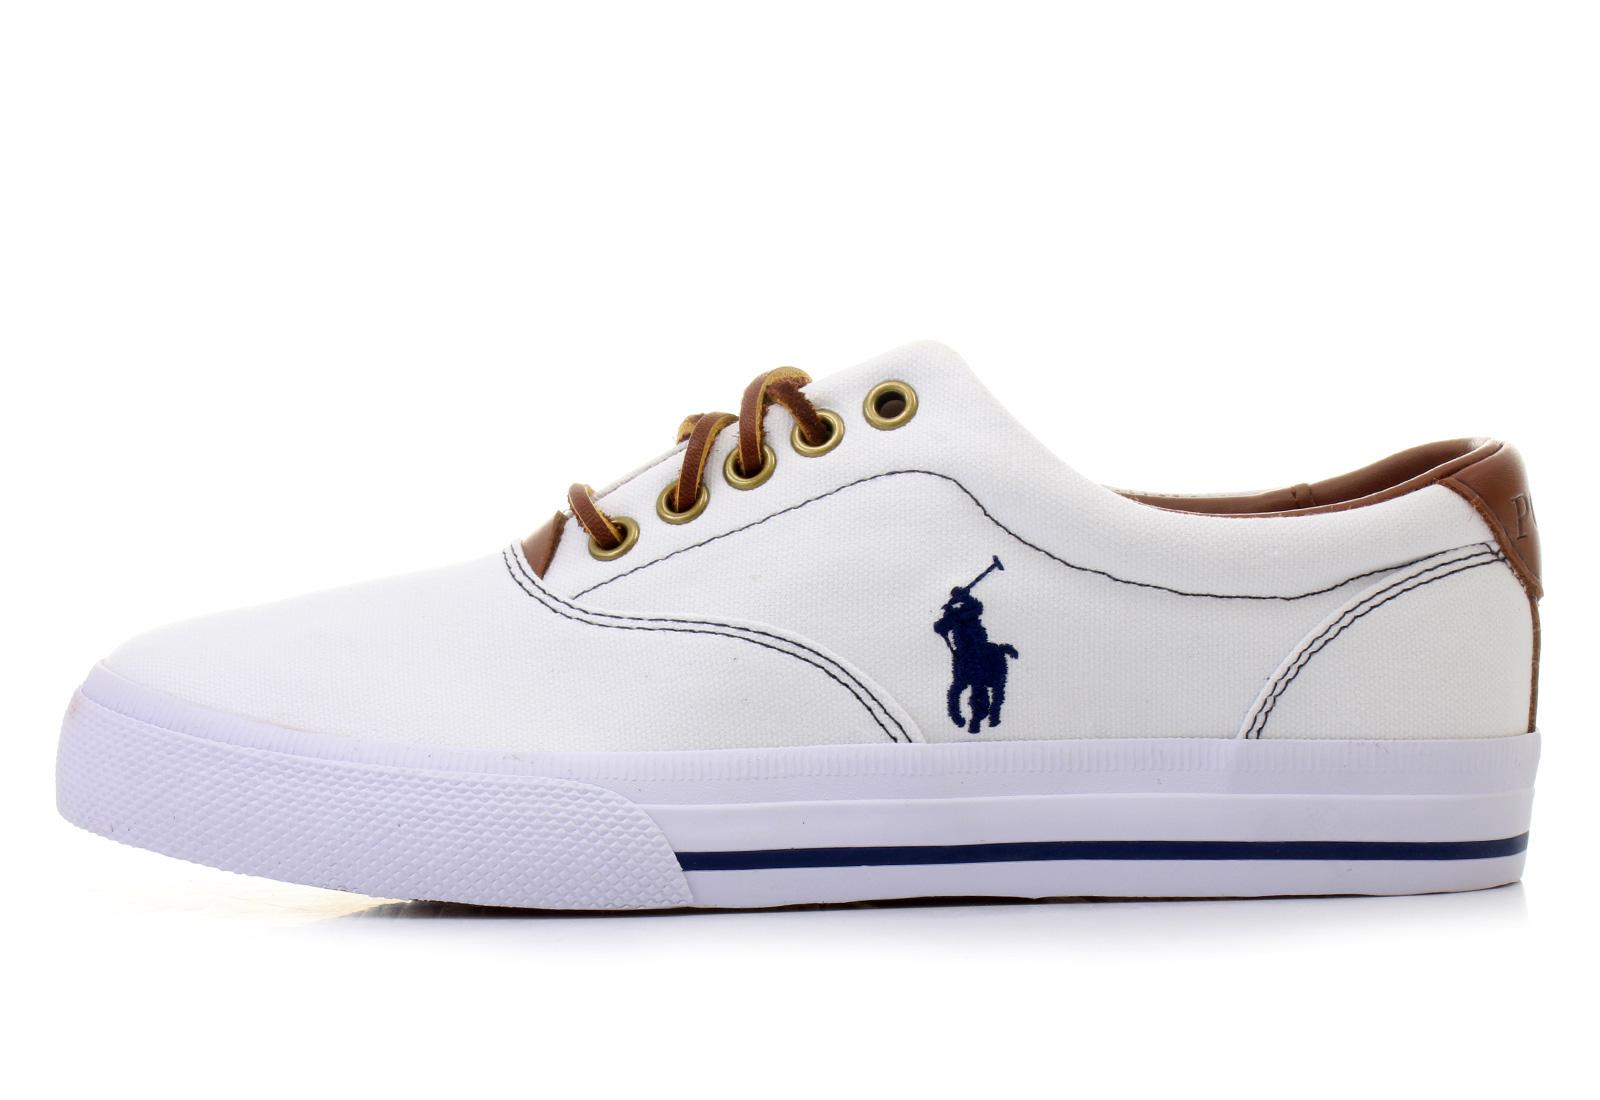 Polo Ralph Lauren Nízké boty - Vaughn - 0222-C-A1000Tenisky 1c4f618b2f